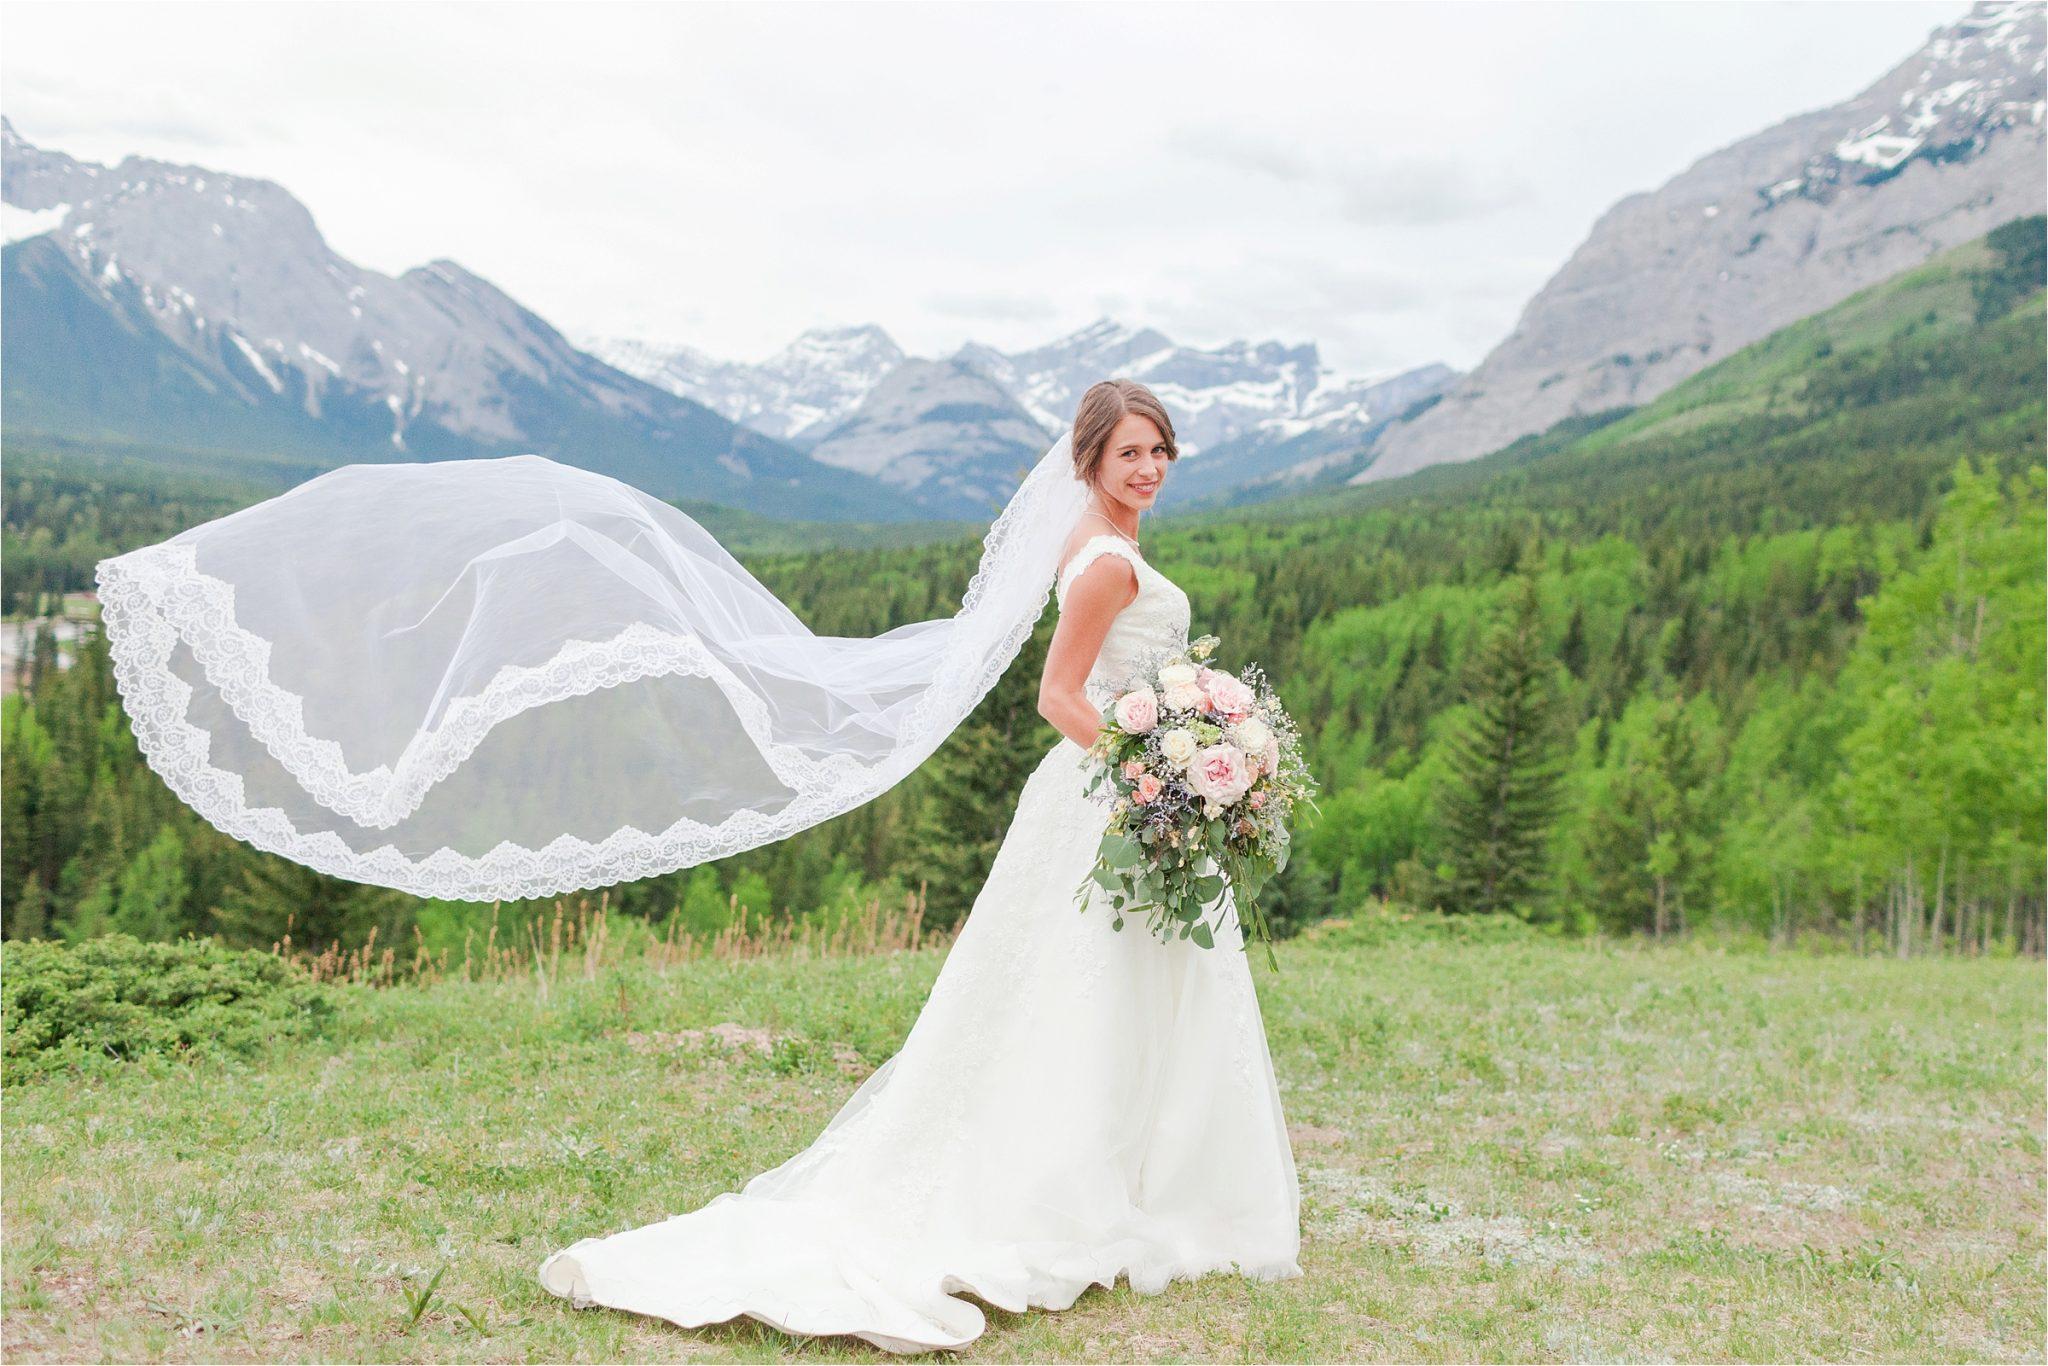 Kananaskis Canada Wedding at the Delta Lodge-Kaitlin & Ricky-Alabama wedding photographer-Lodge wedding-Bridal photography-Mountain wedding-Wedding dress inspiration-Bridal bouquet